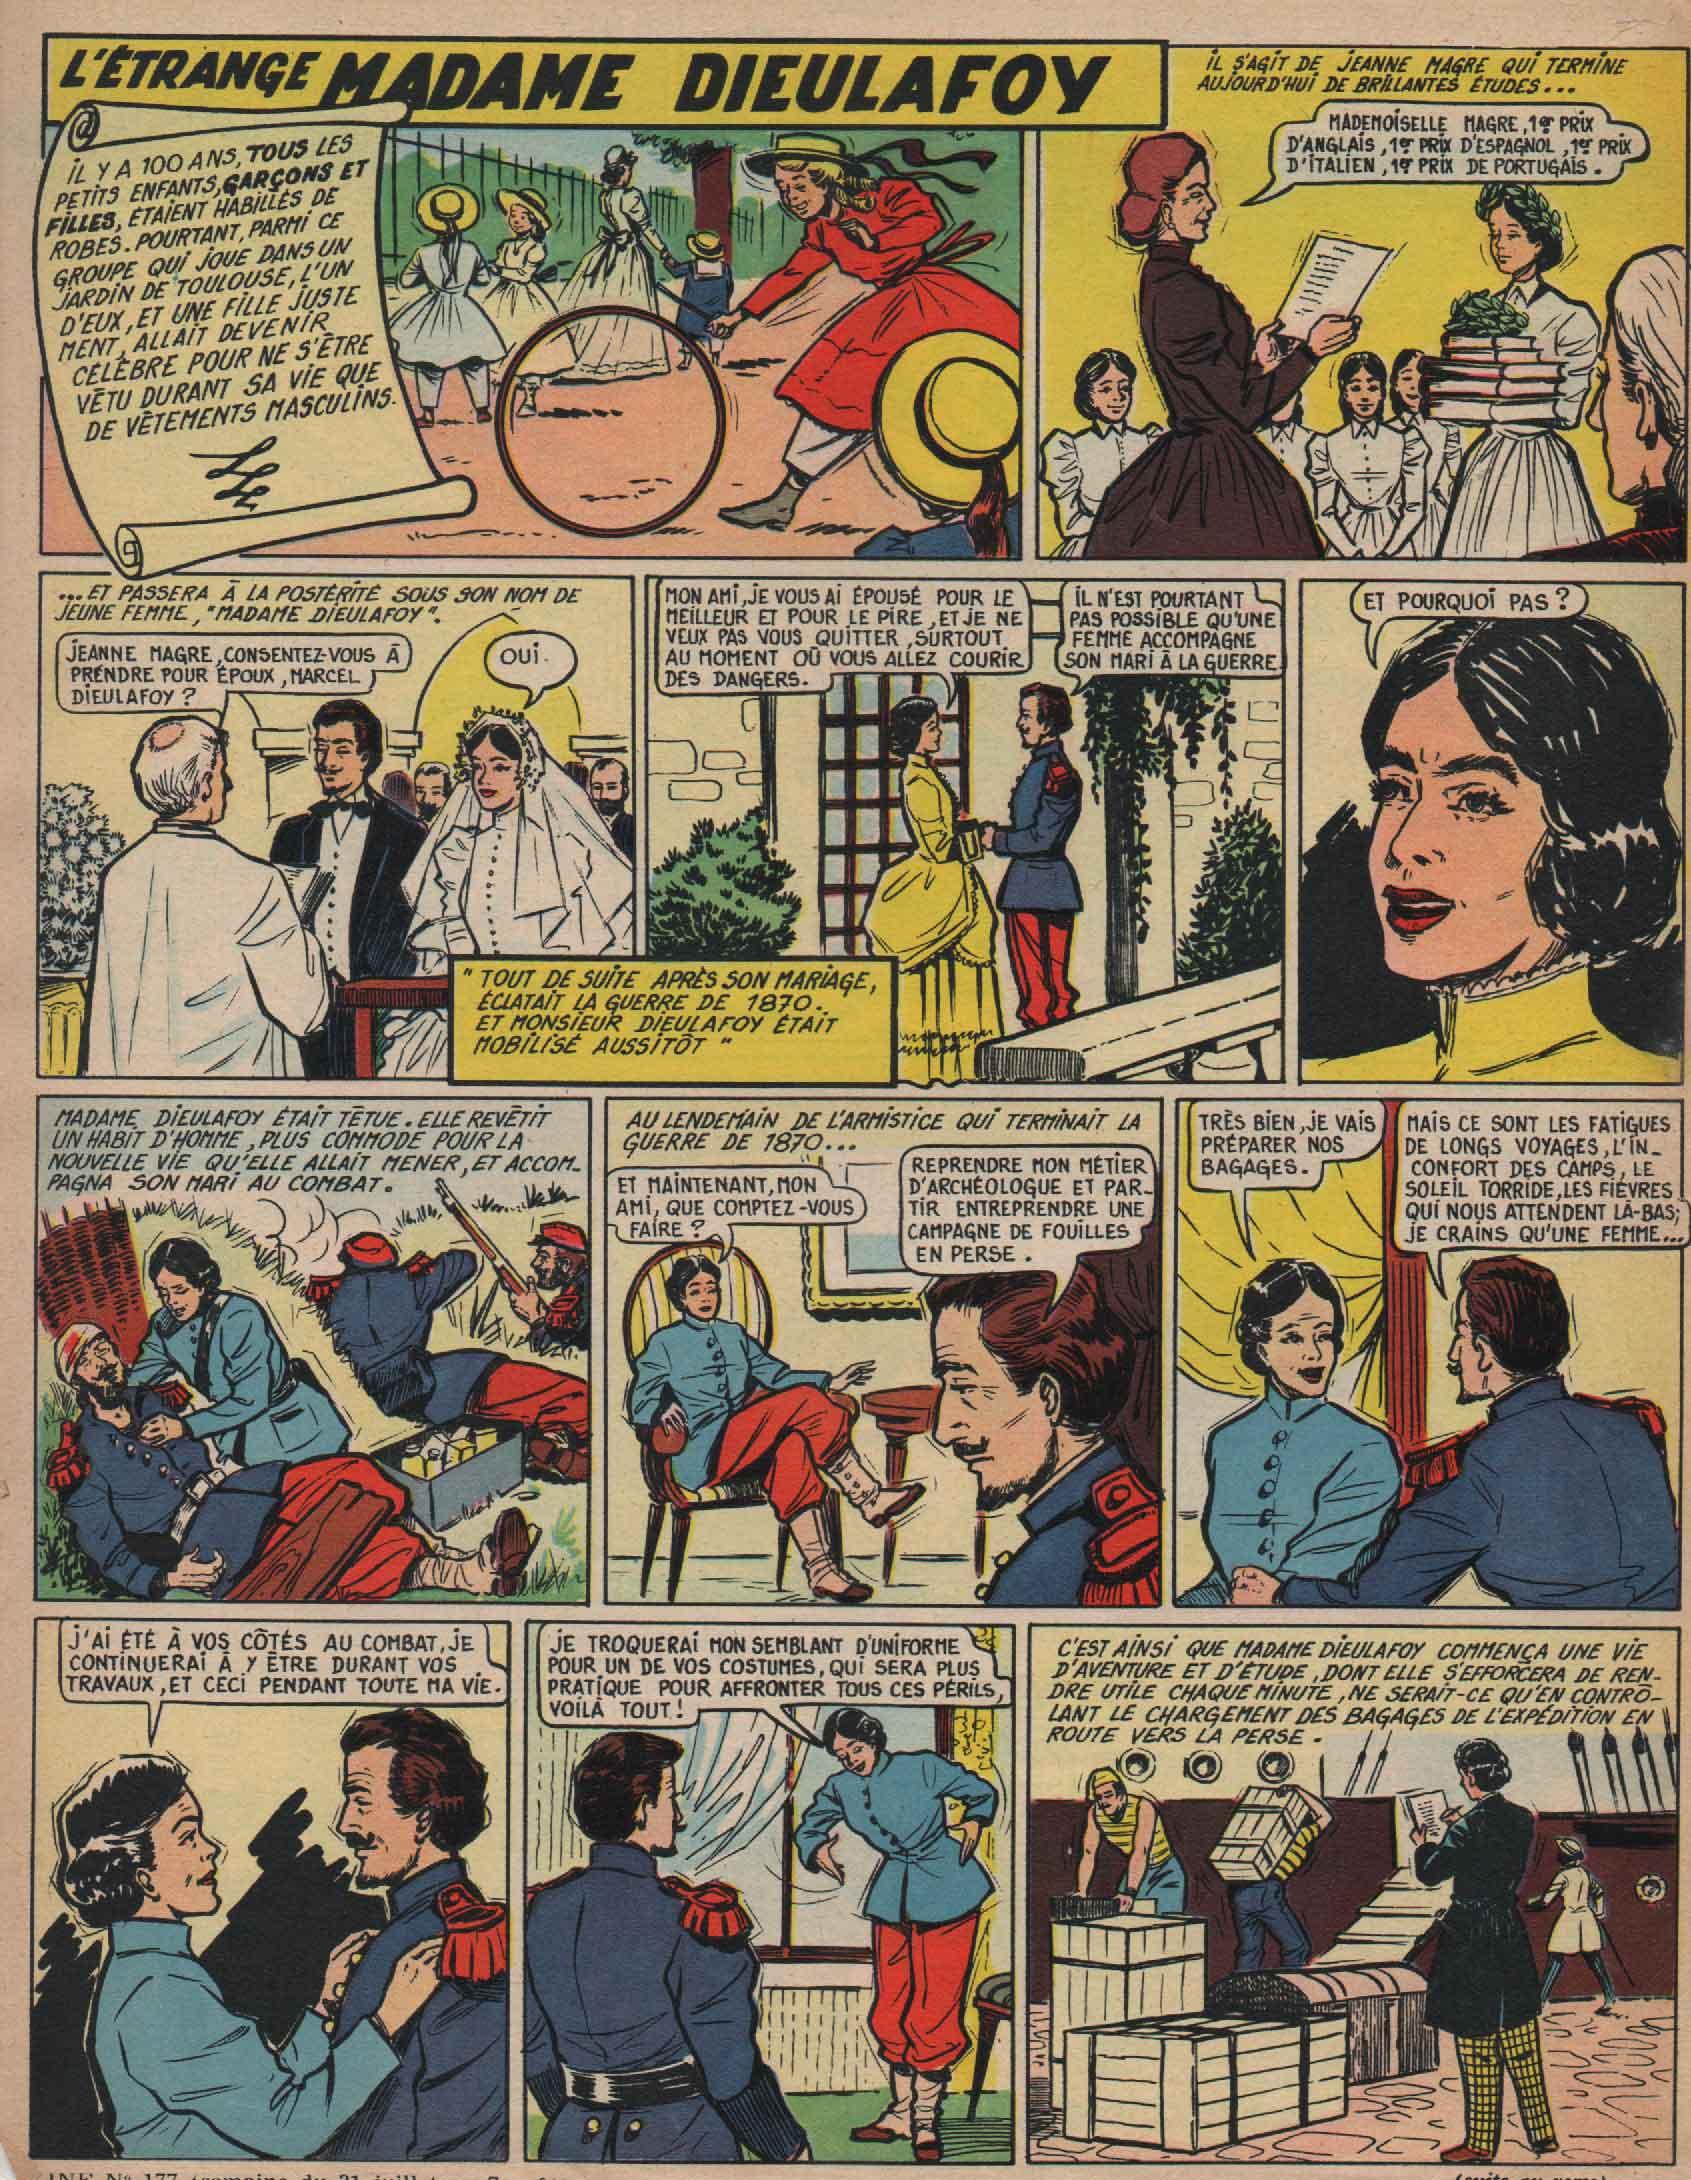 « L'Étrange Madame Dieulafoy » Line n° 177 (31/07/1958).